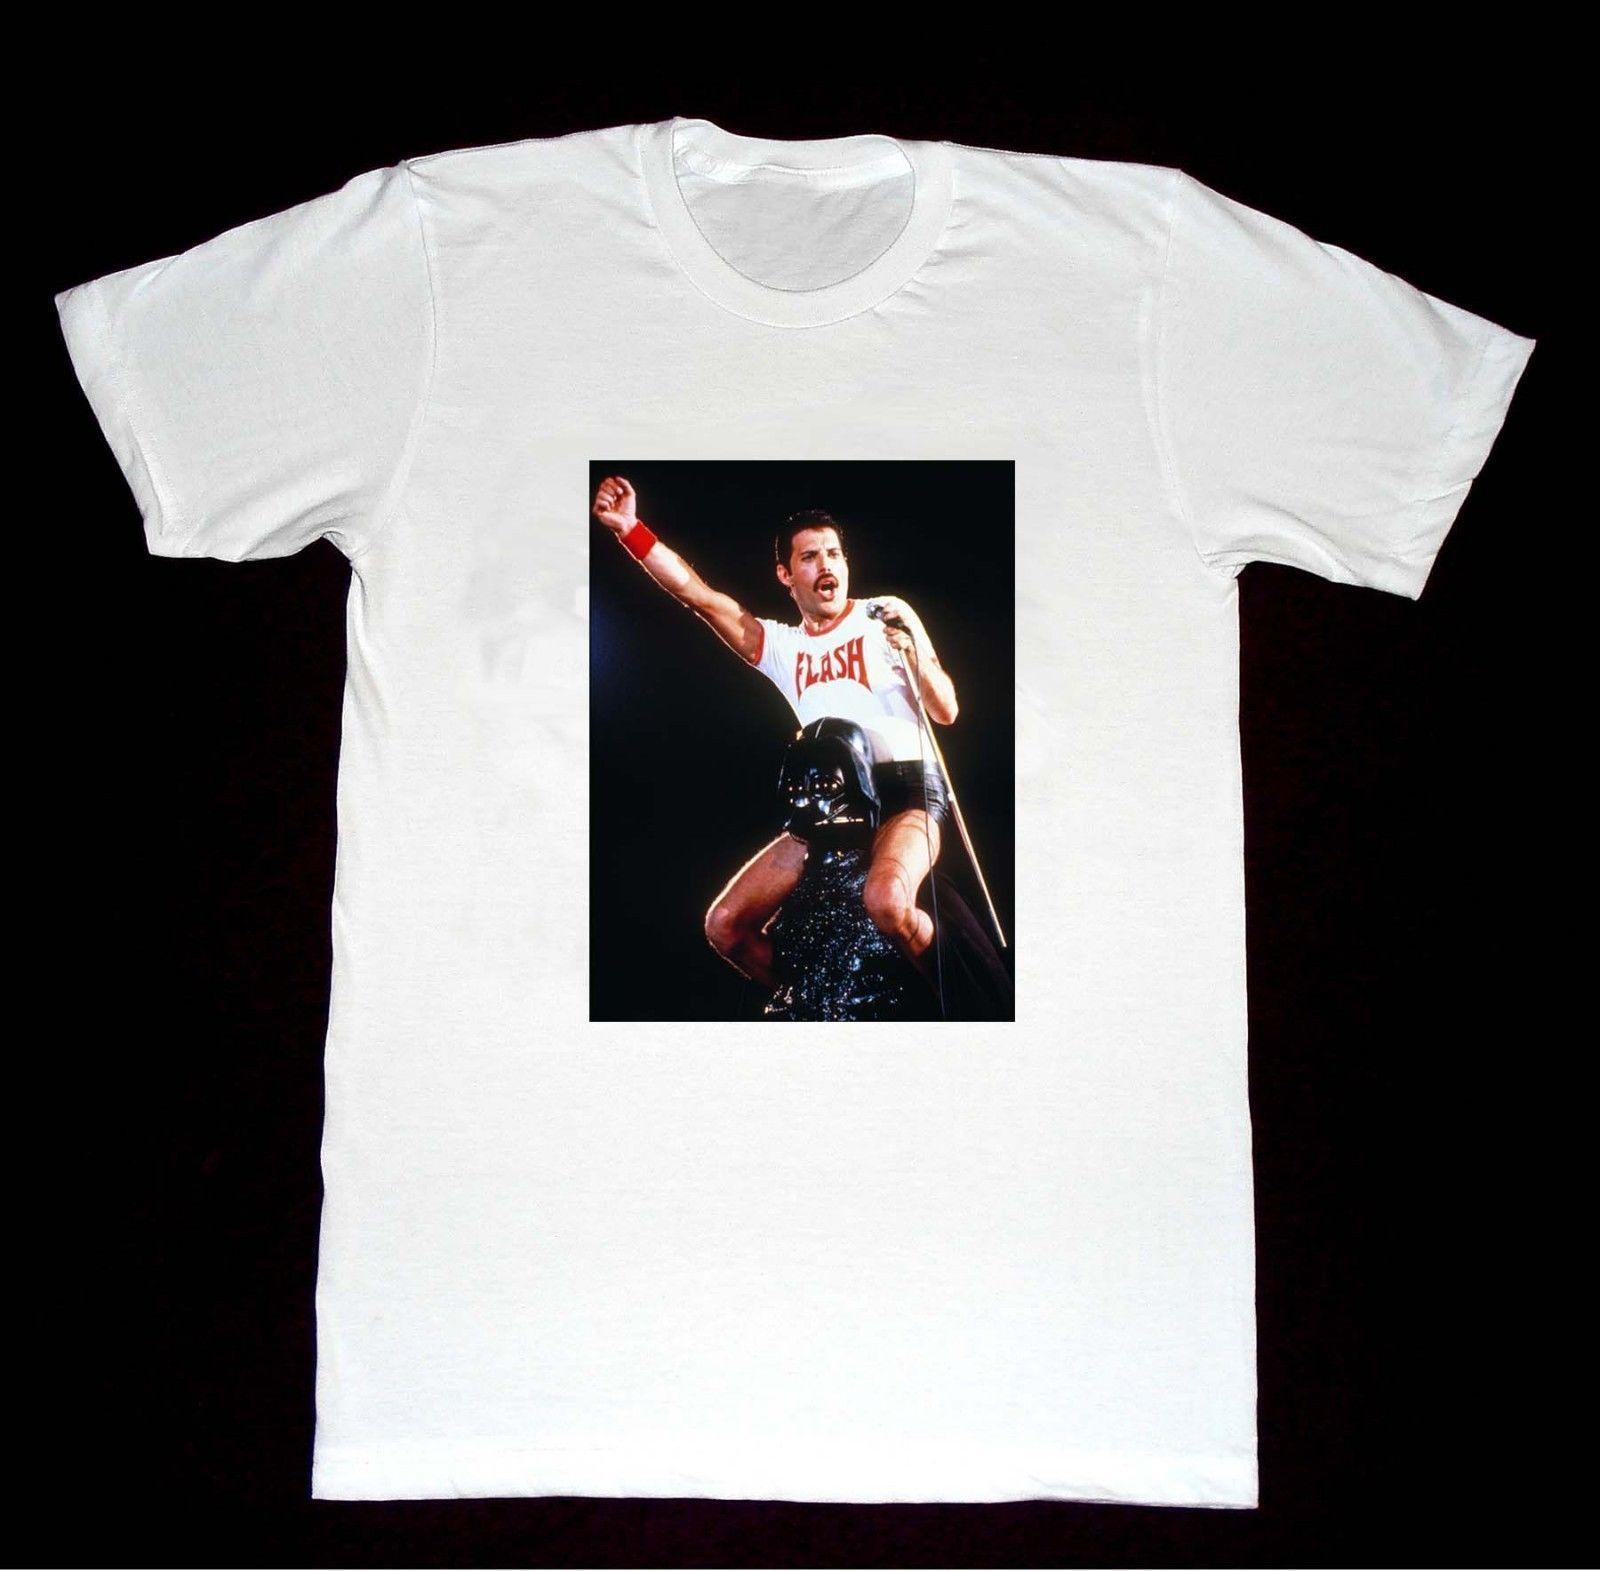 4149c2de Queen Freddie Mercury Flash Gordon Tshirt T Shirt Deals Humor Shirts From  Crazylikeafawkes, $11.01| DHgate.Com